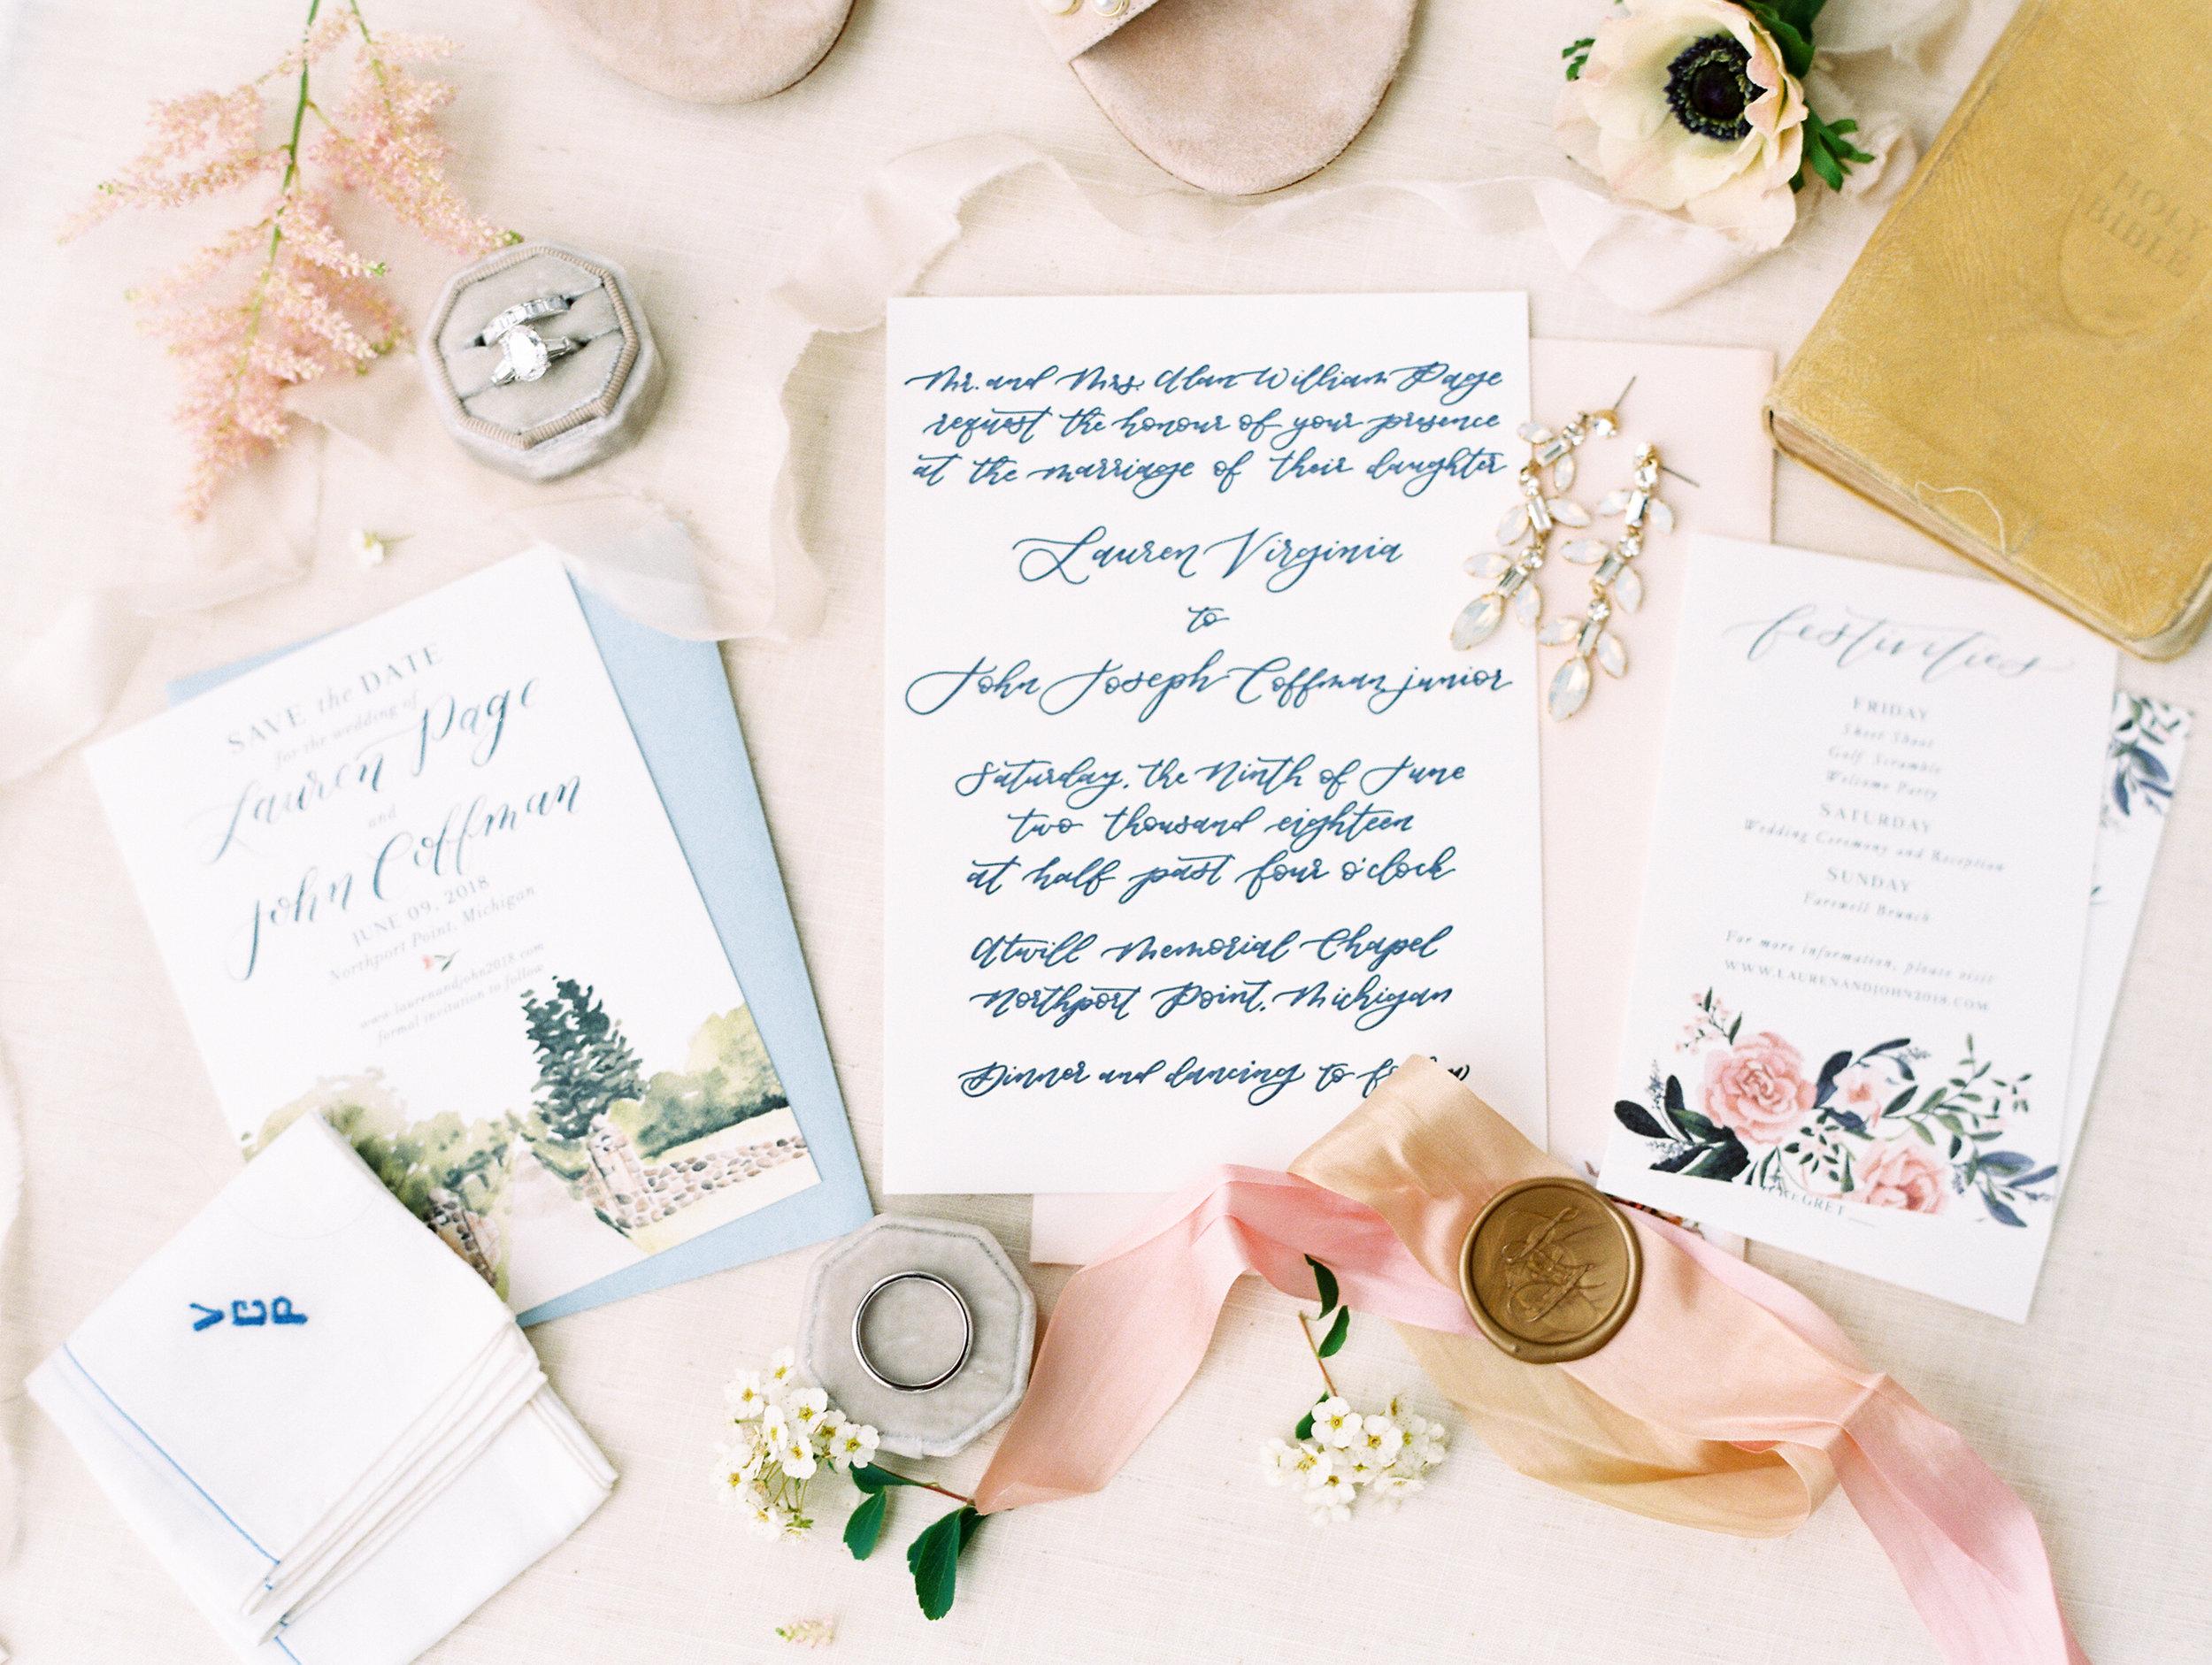 Coffman+Wedding+Details-63.jpg